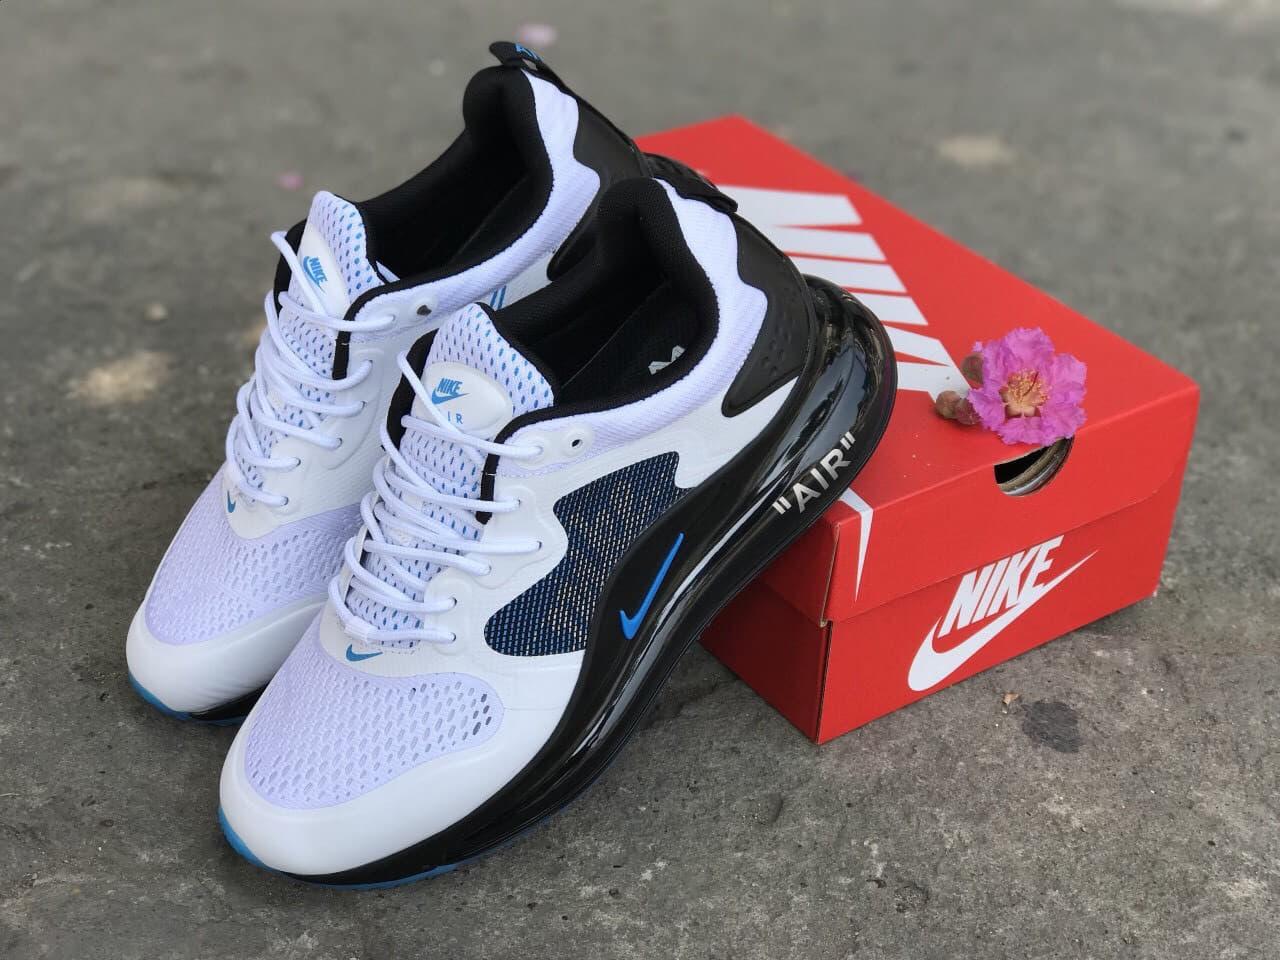 Nike Airmax 720 White Shadow